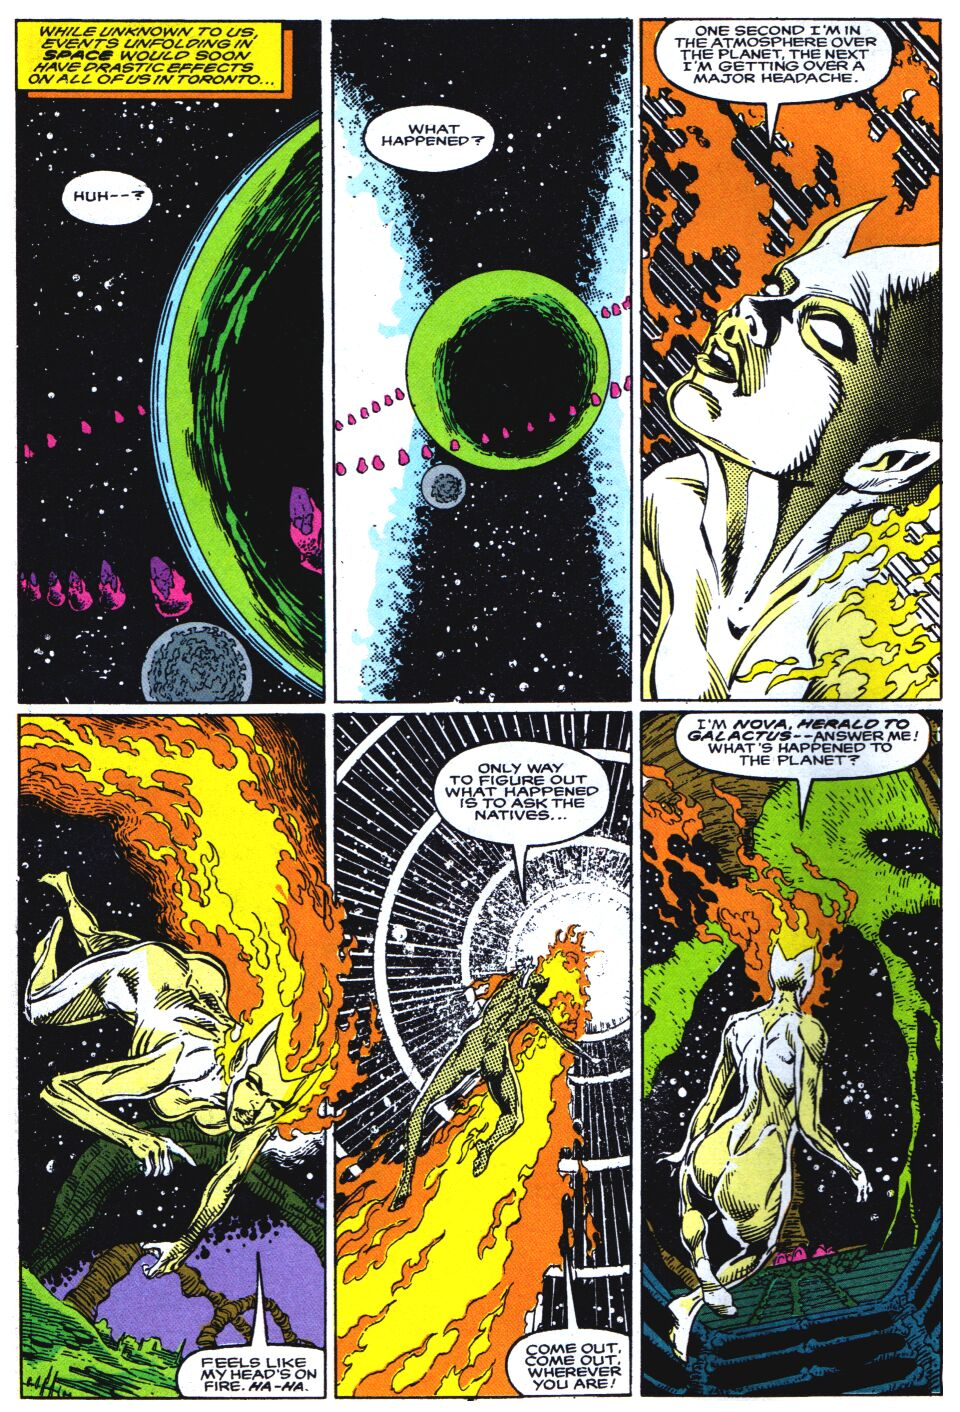 Read online Alpha Flight Special comic -  Issue #3 - 3